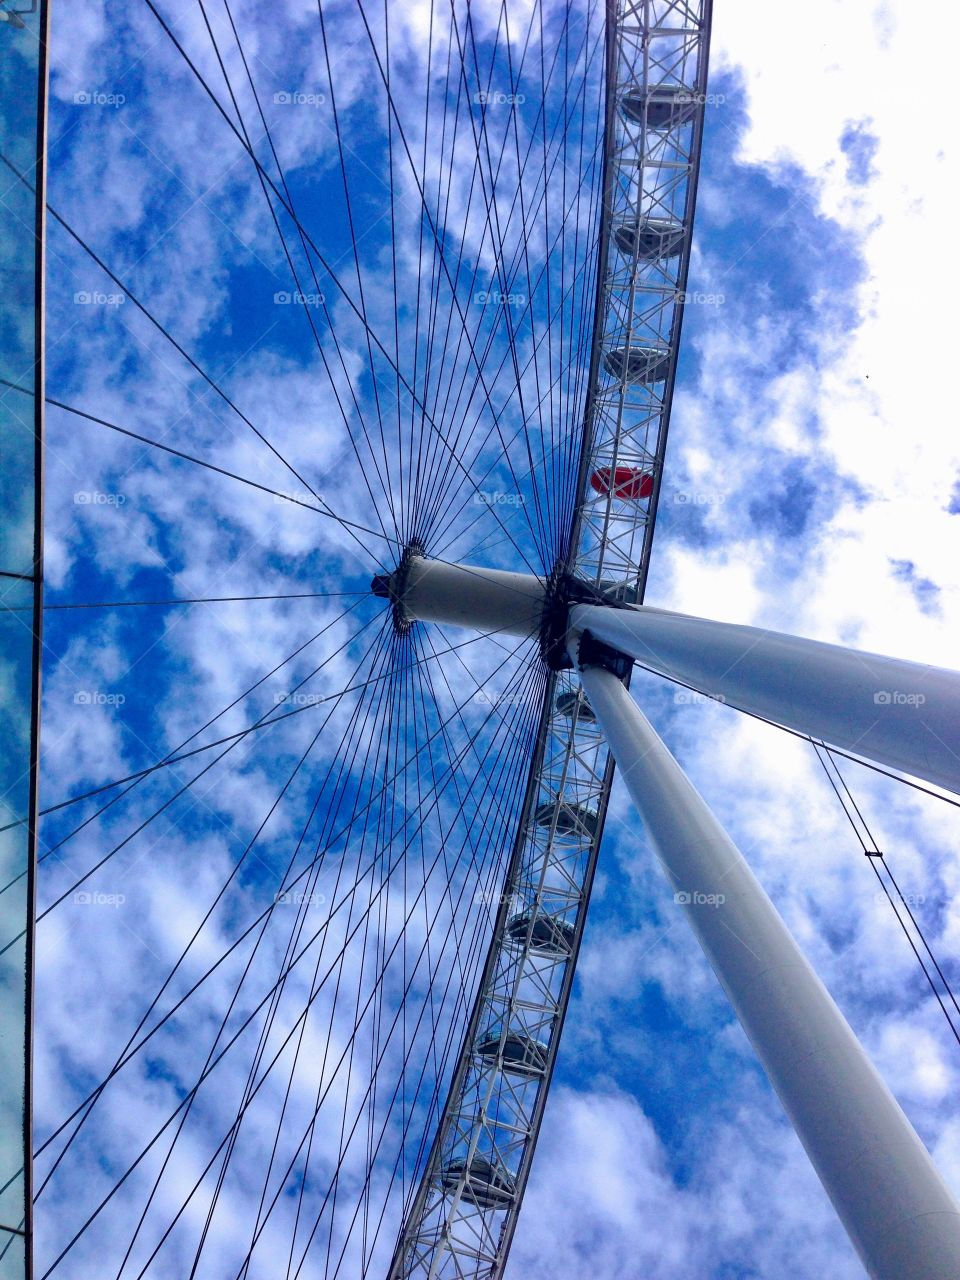 London eye close